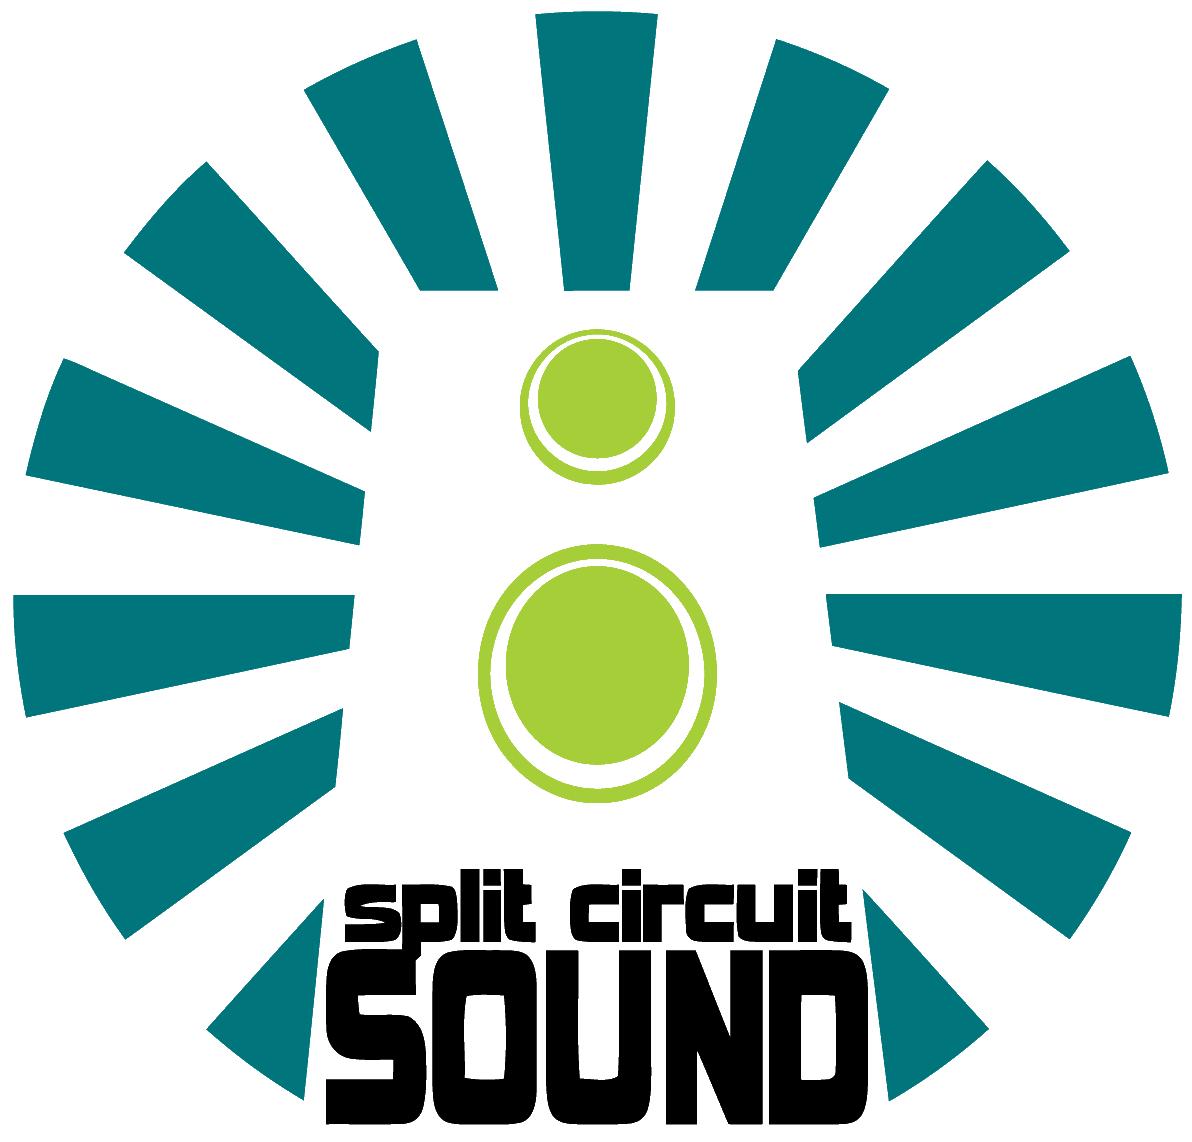 Split Circuit - Black Text - Tranparent Background.png